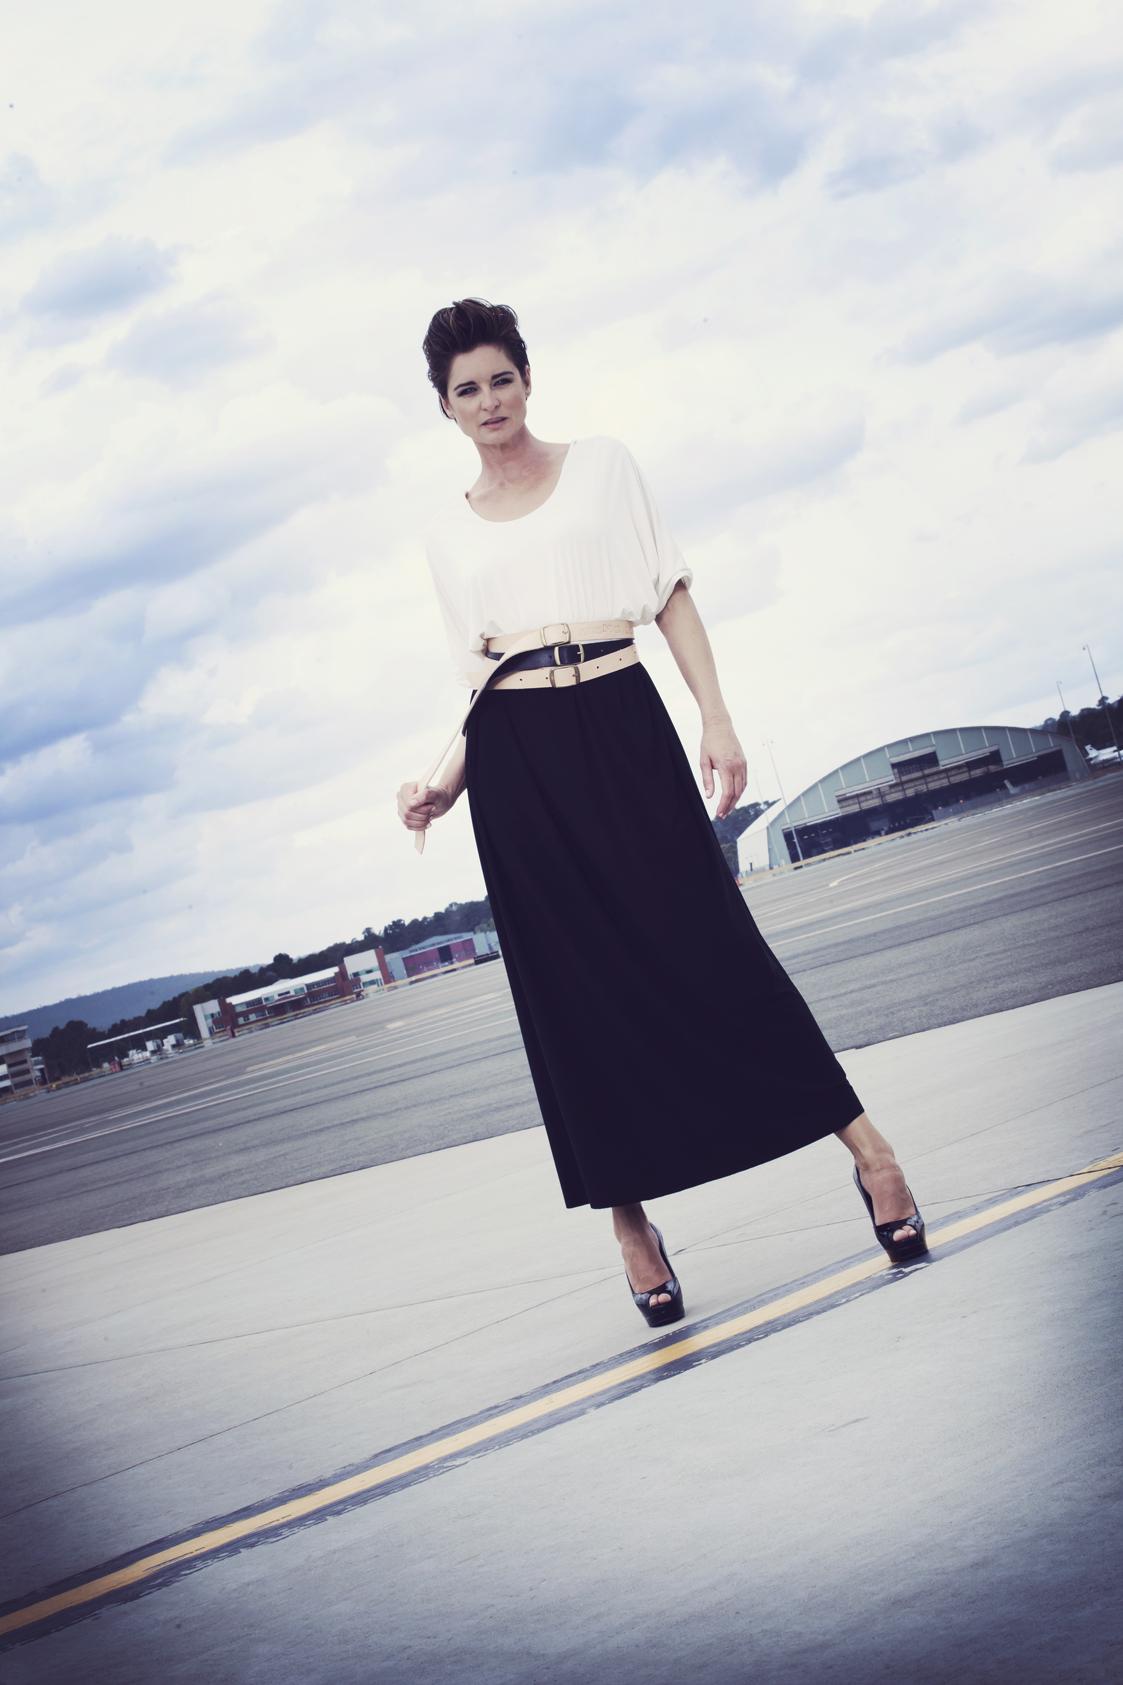 Photo:  Leighton Hutchinson  | Model: Belinda RIding | Location:  Canberra Airport